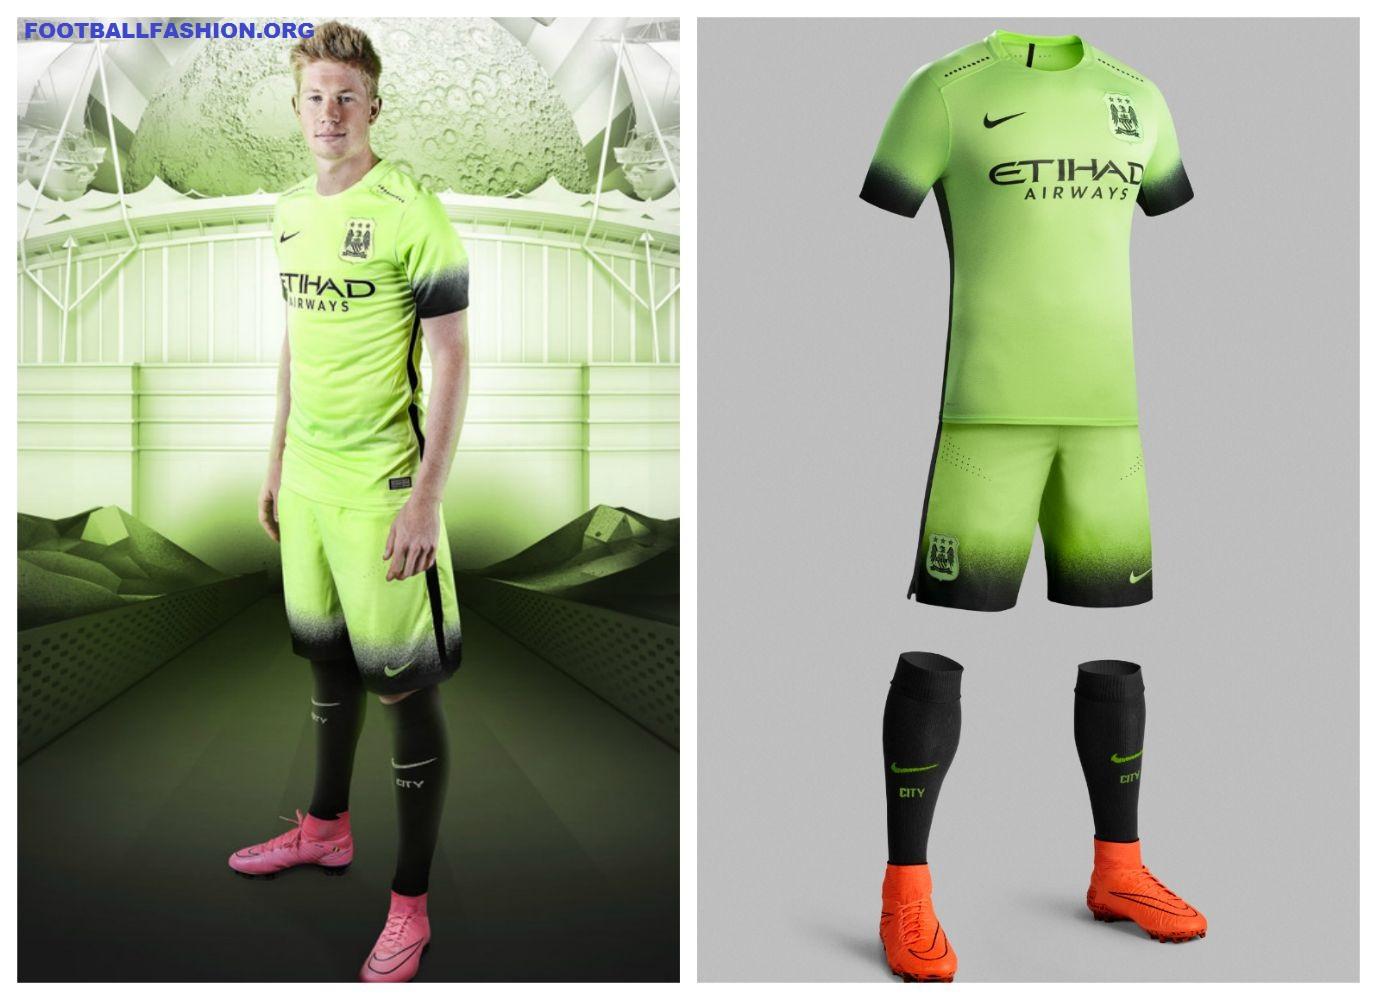 Manchester City 2015/16 Nike Third Kit - FOOTBALL FASHION.ORG